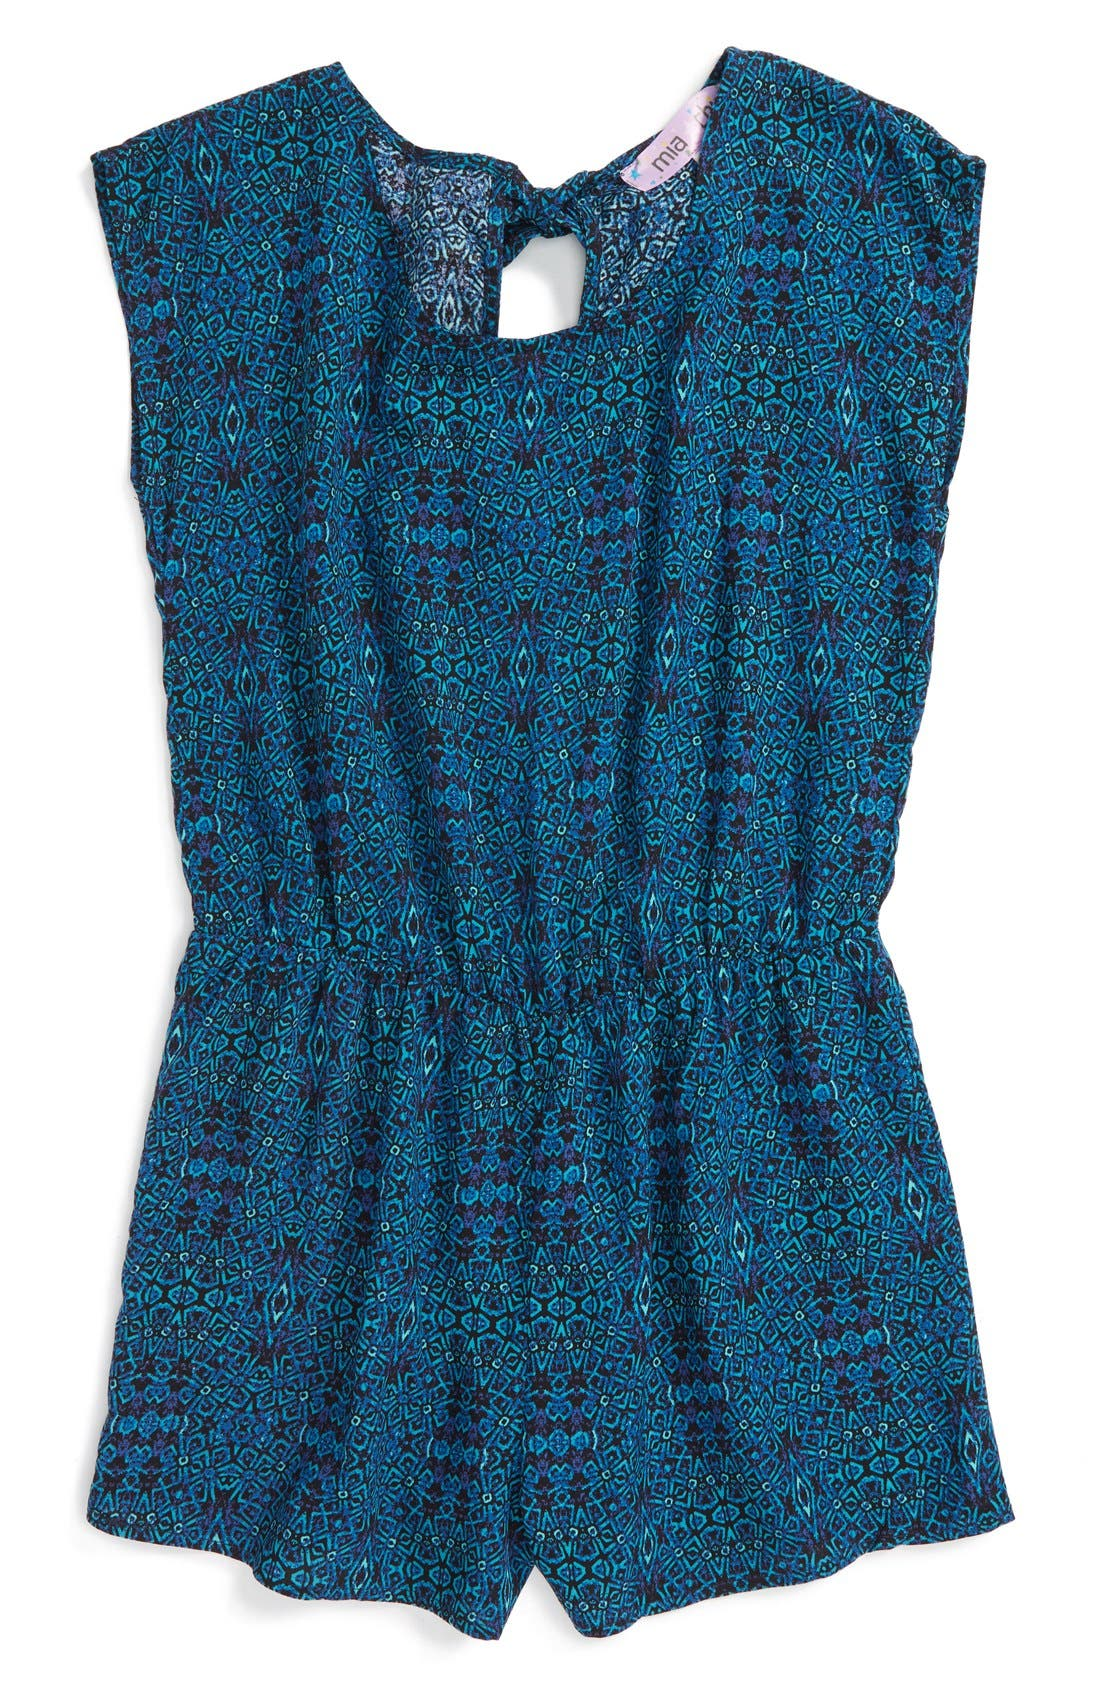 Alternate Image 1 Selected - Mia Chica Floral Print Cap Sleeve Romper (Big Girls)